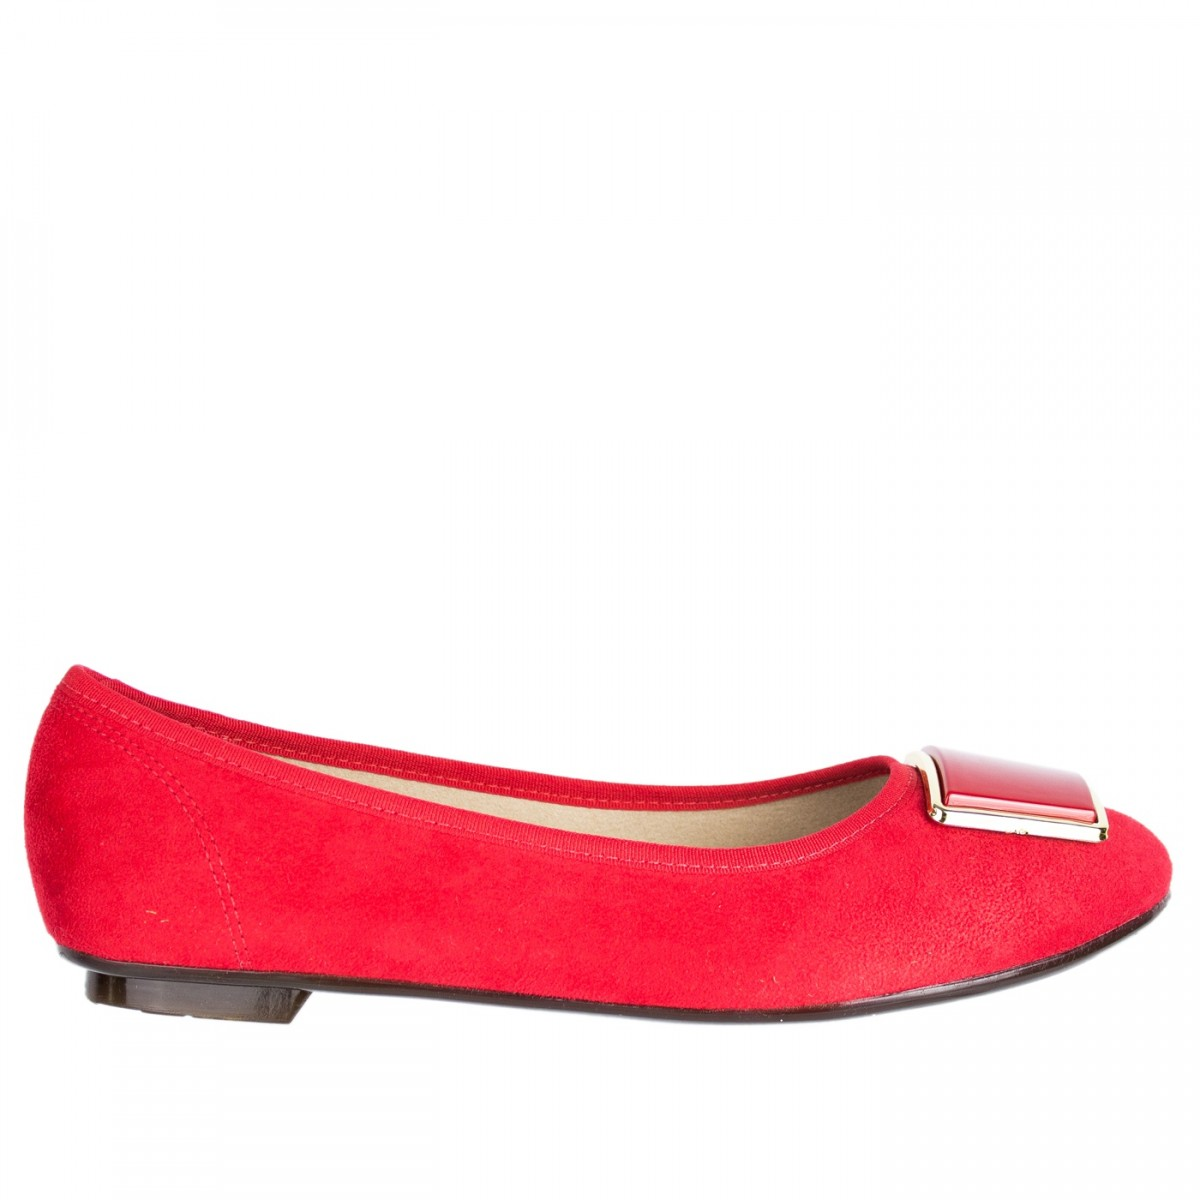 88be59767 Bizz Store - Sapatilha Feminina Moleca Couro Nobuck Vermelha